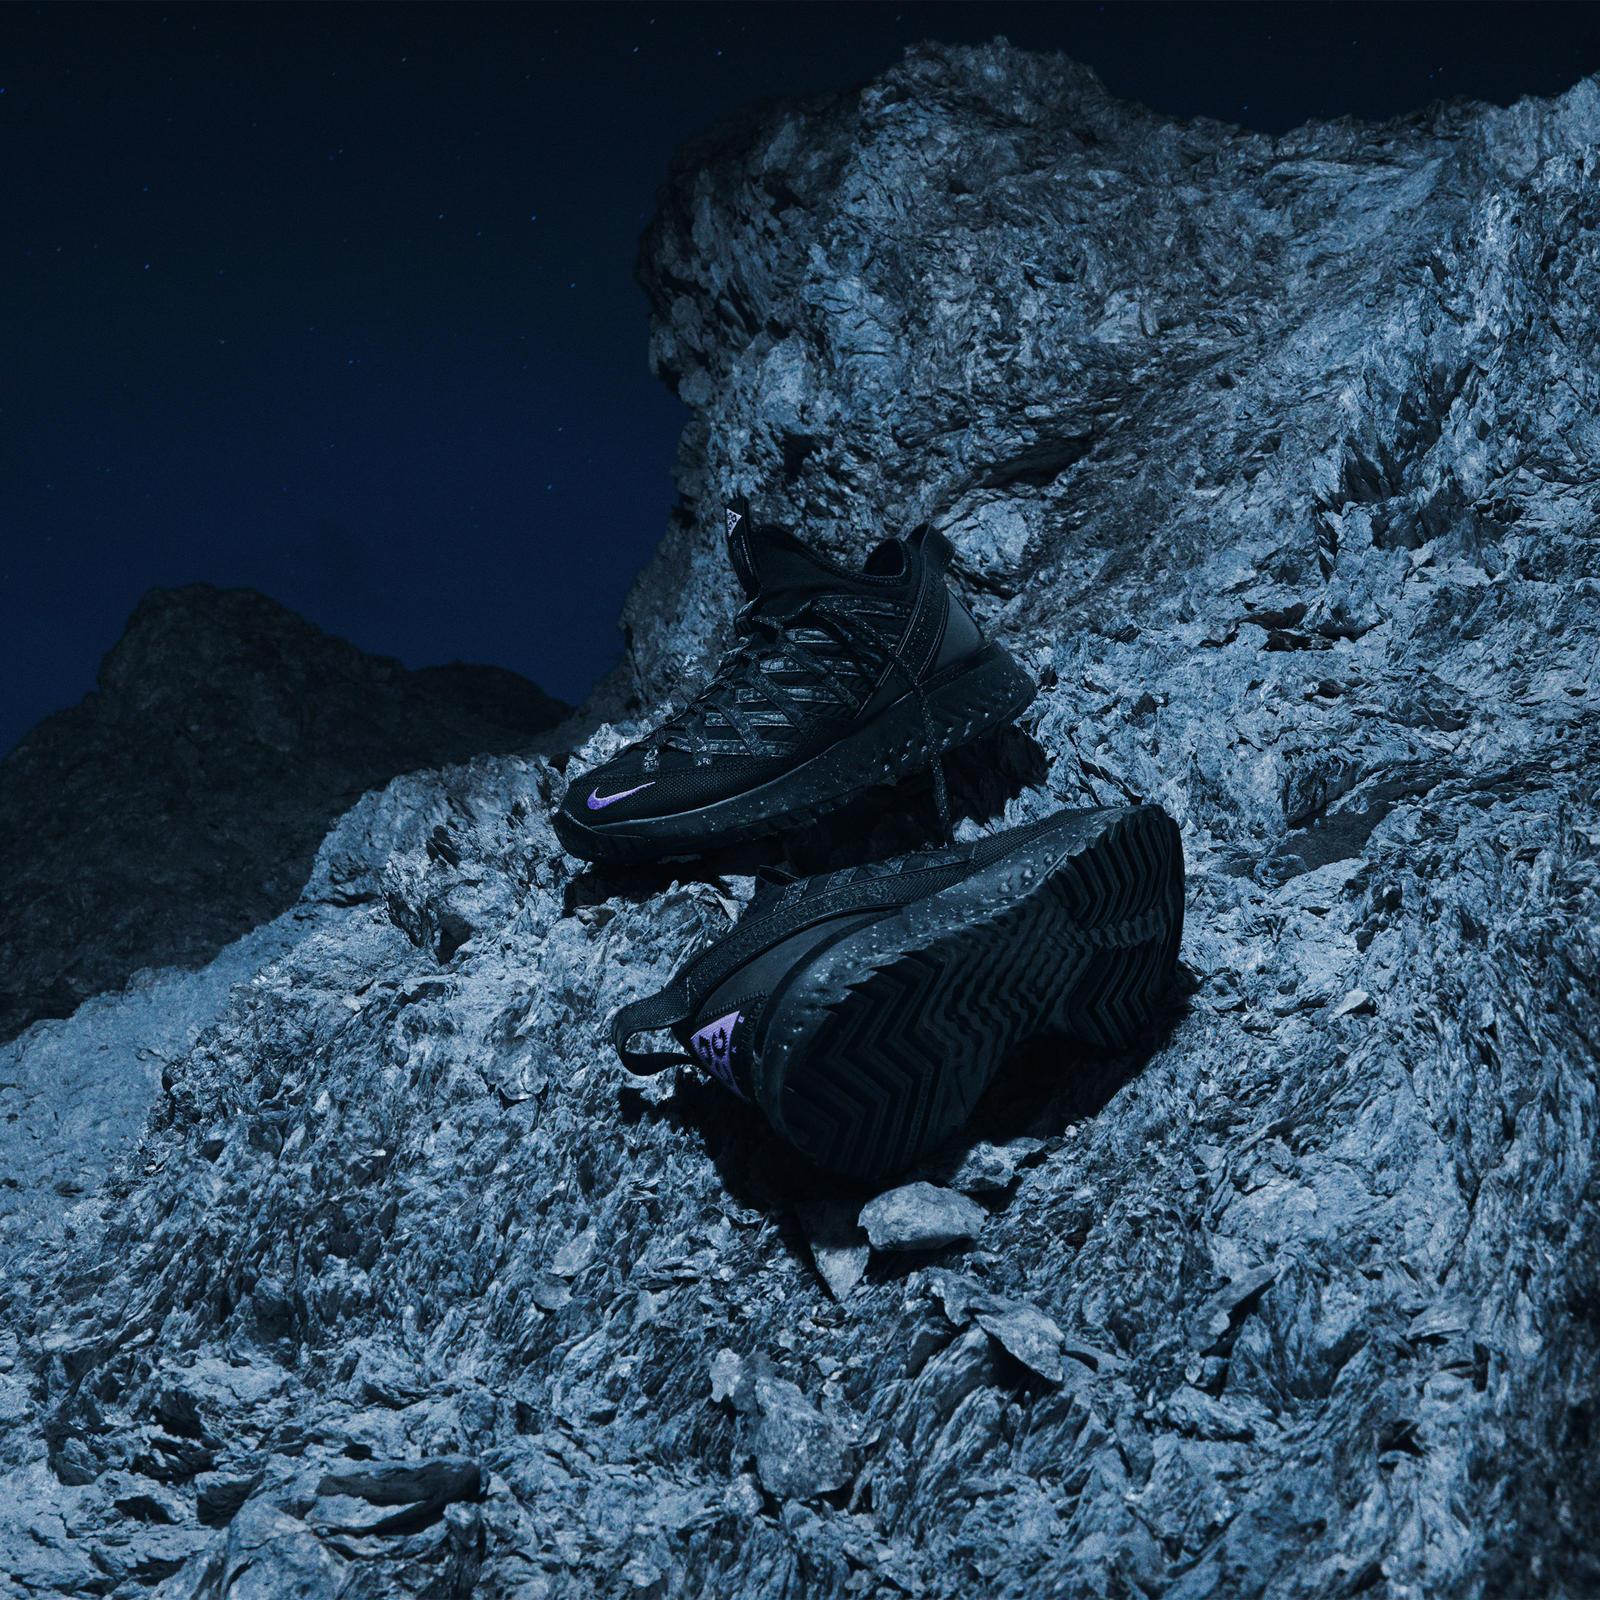 NikeNews_FA19_ACG_Campaign_Primary_Gobe_Footwear_2_89565.jpg